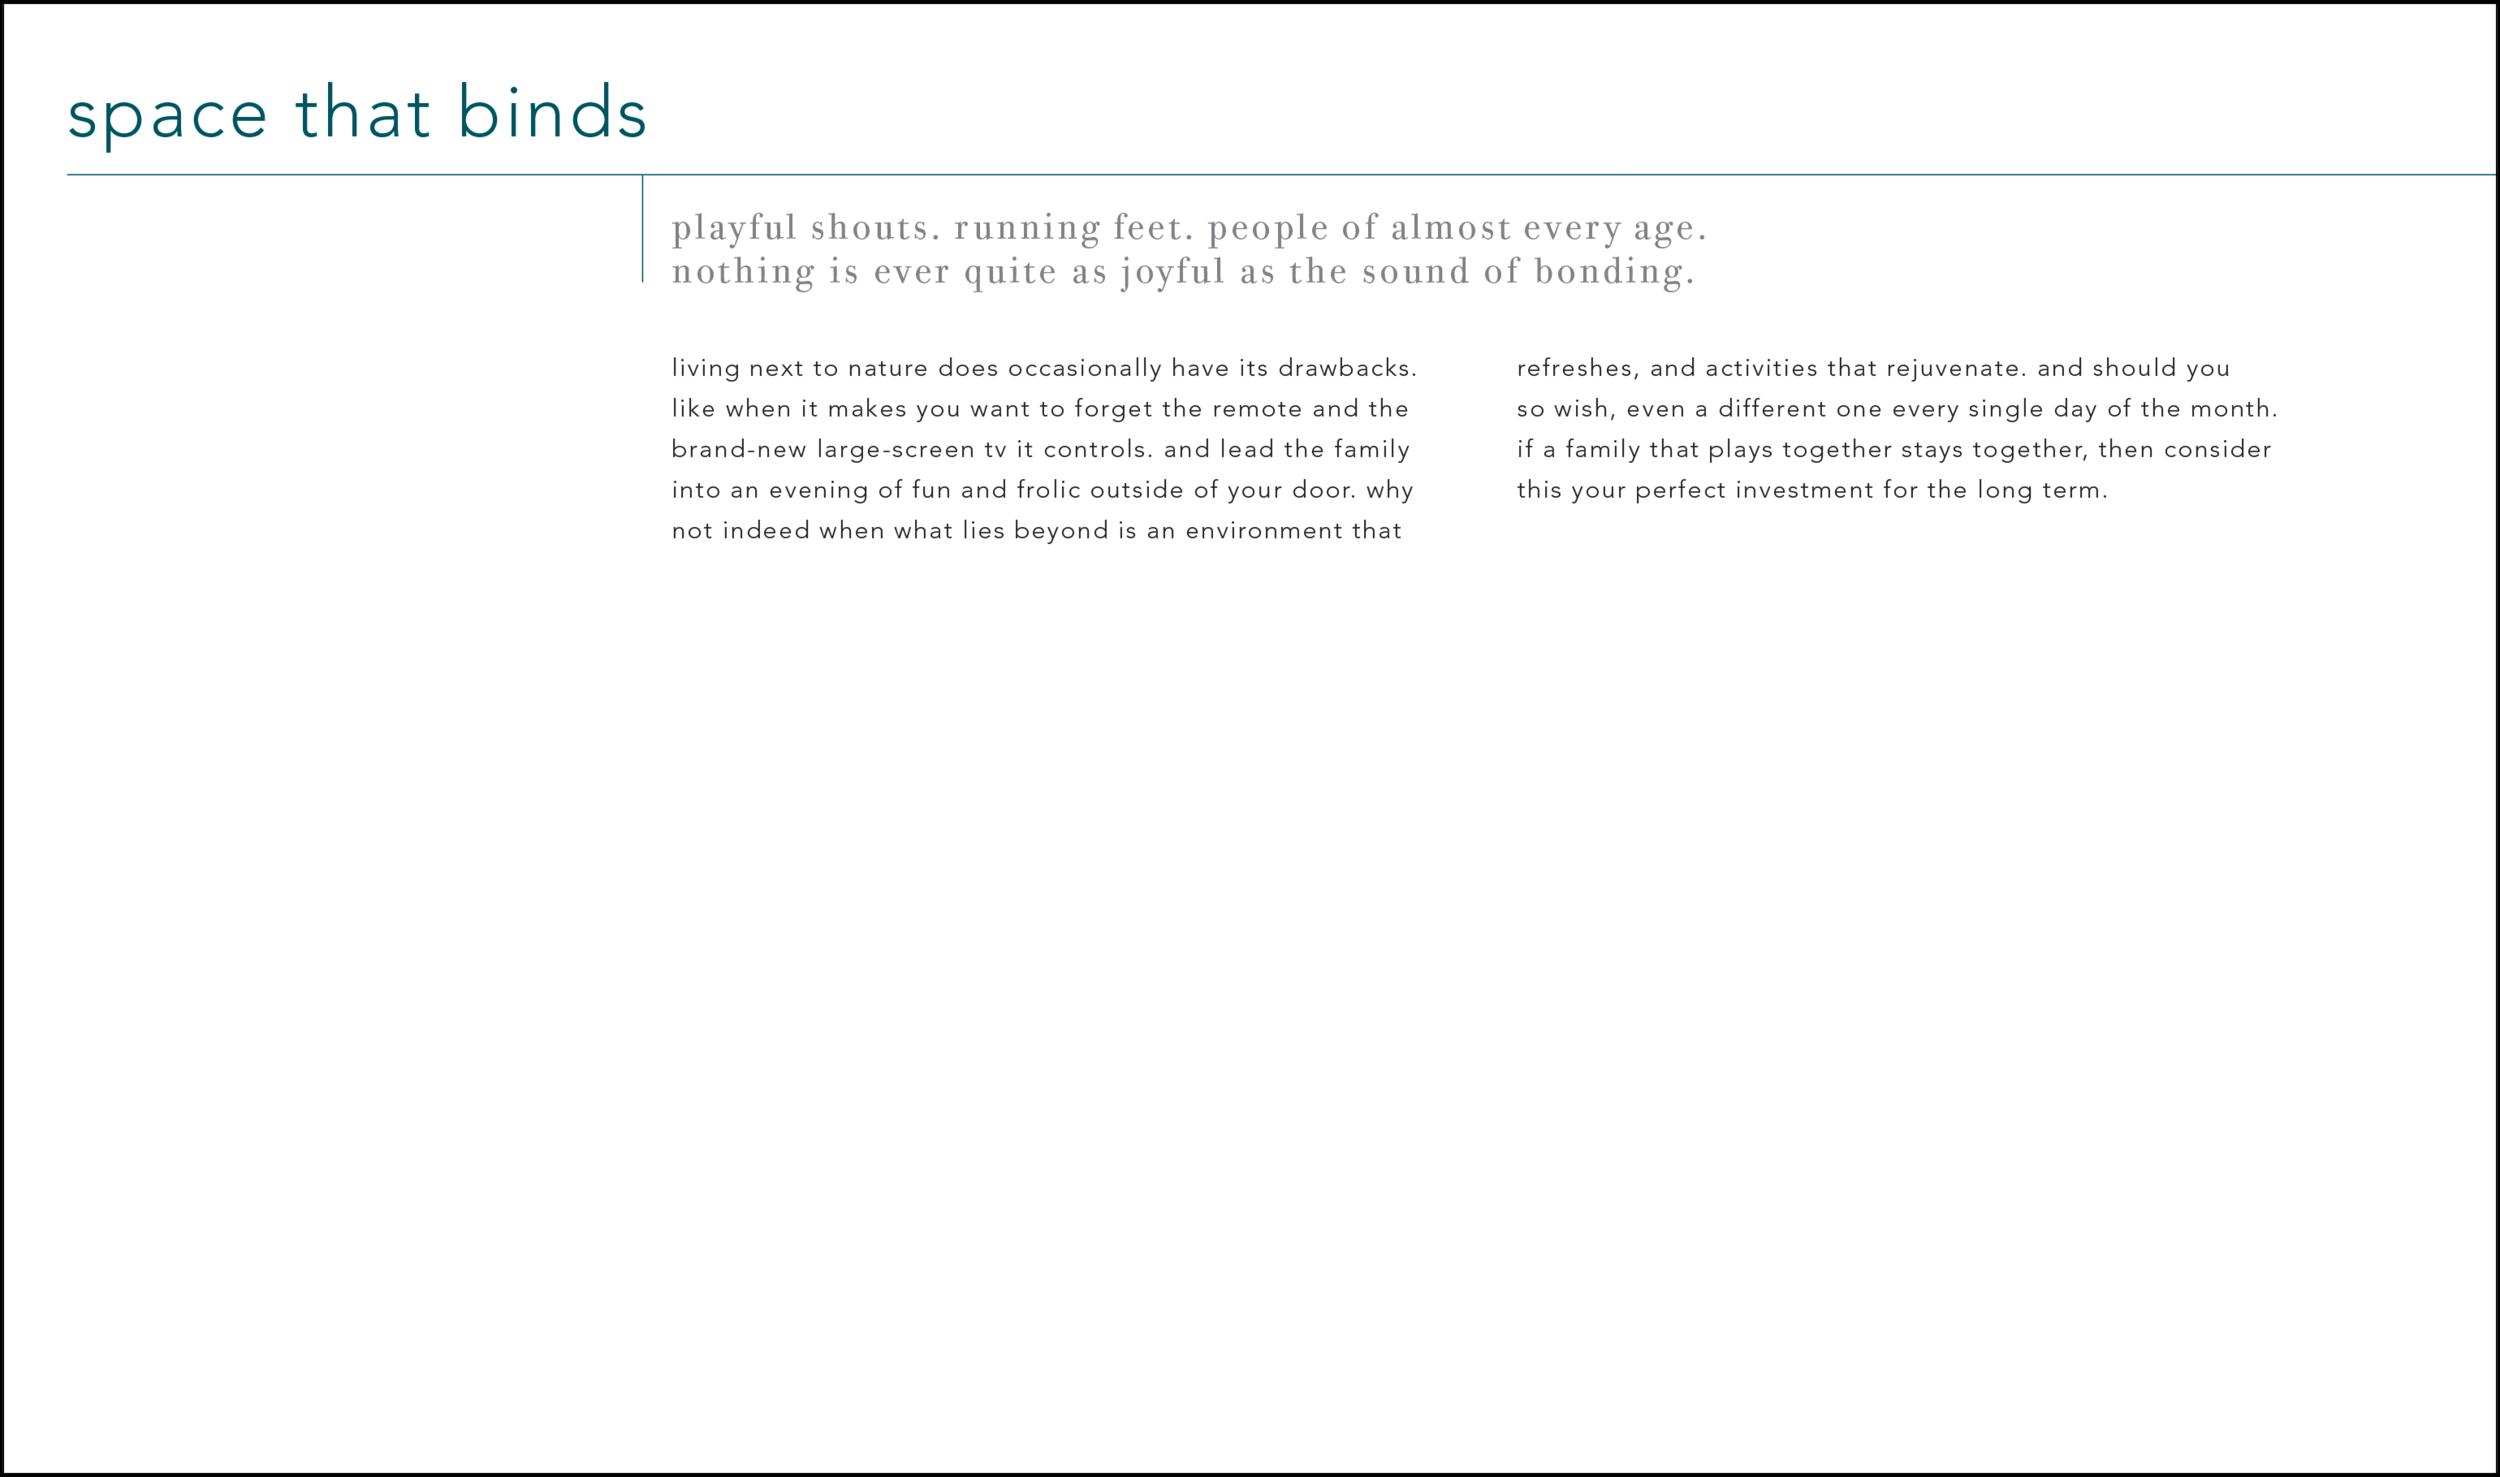 EL_Main Brochure_Space that binds.png